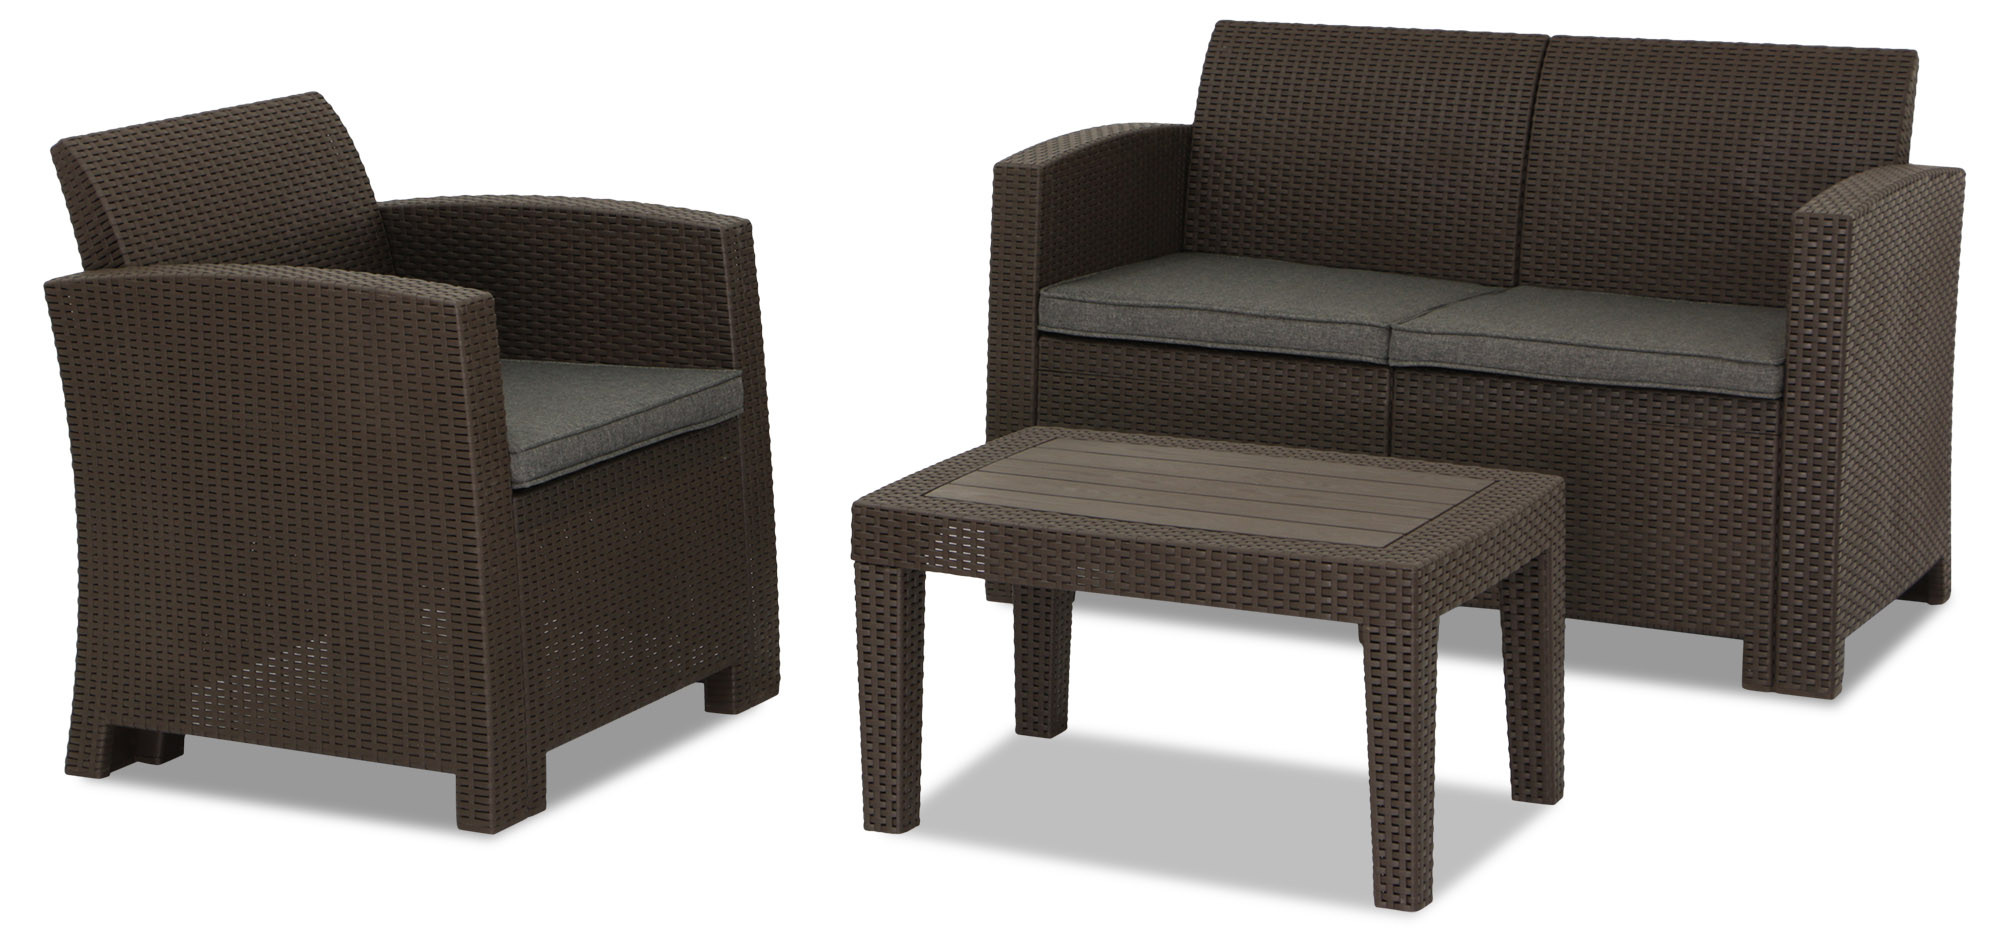 Nina 4 Seater Outdoor Sofa Set Brown Furniture Home